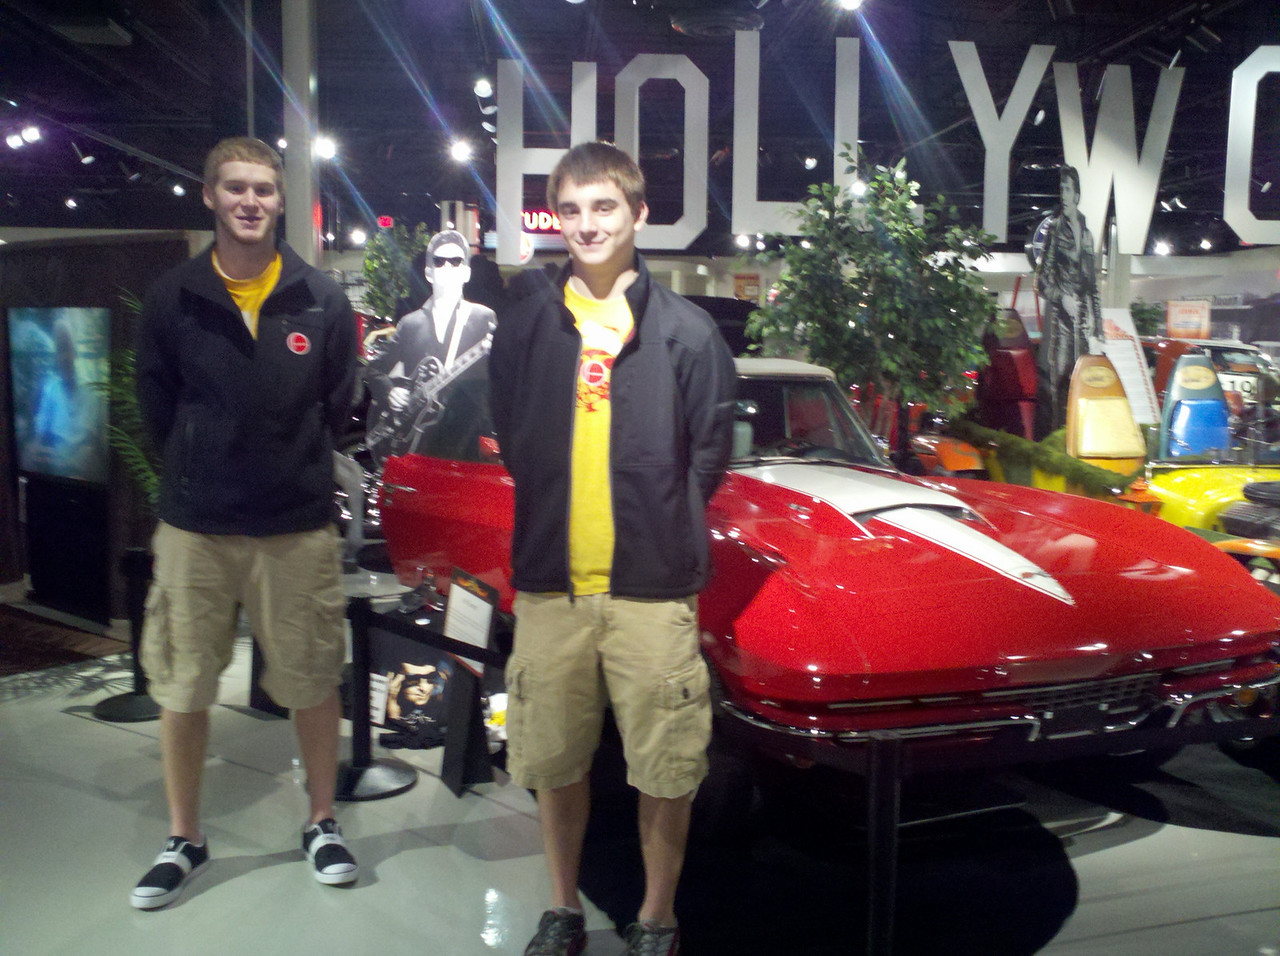 03-31-2011 - How sweet - Roy Orbison's 1967 Corvette -